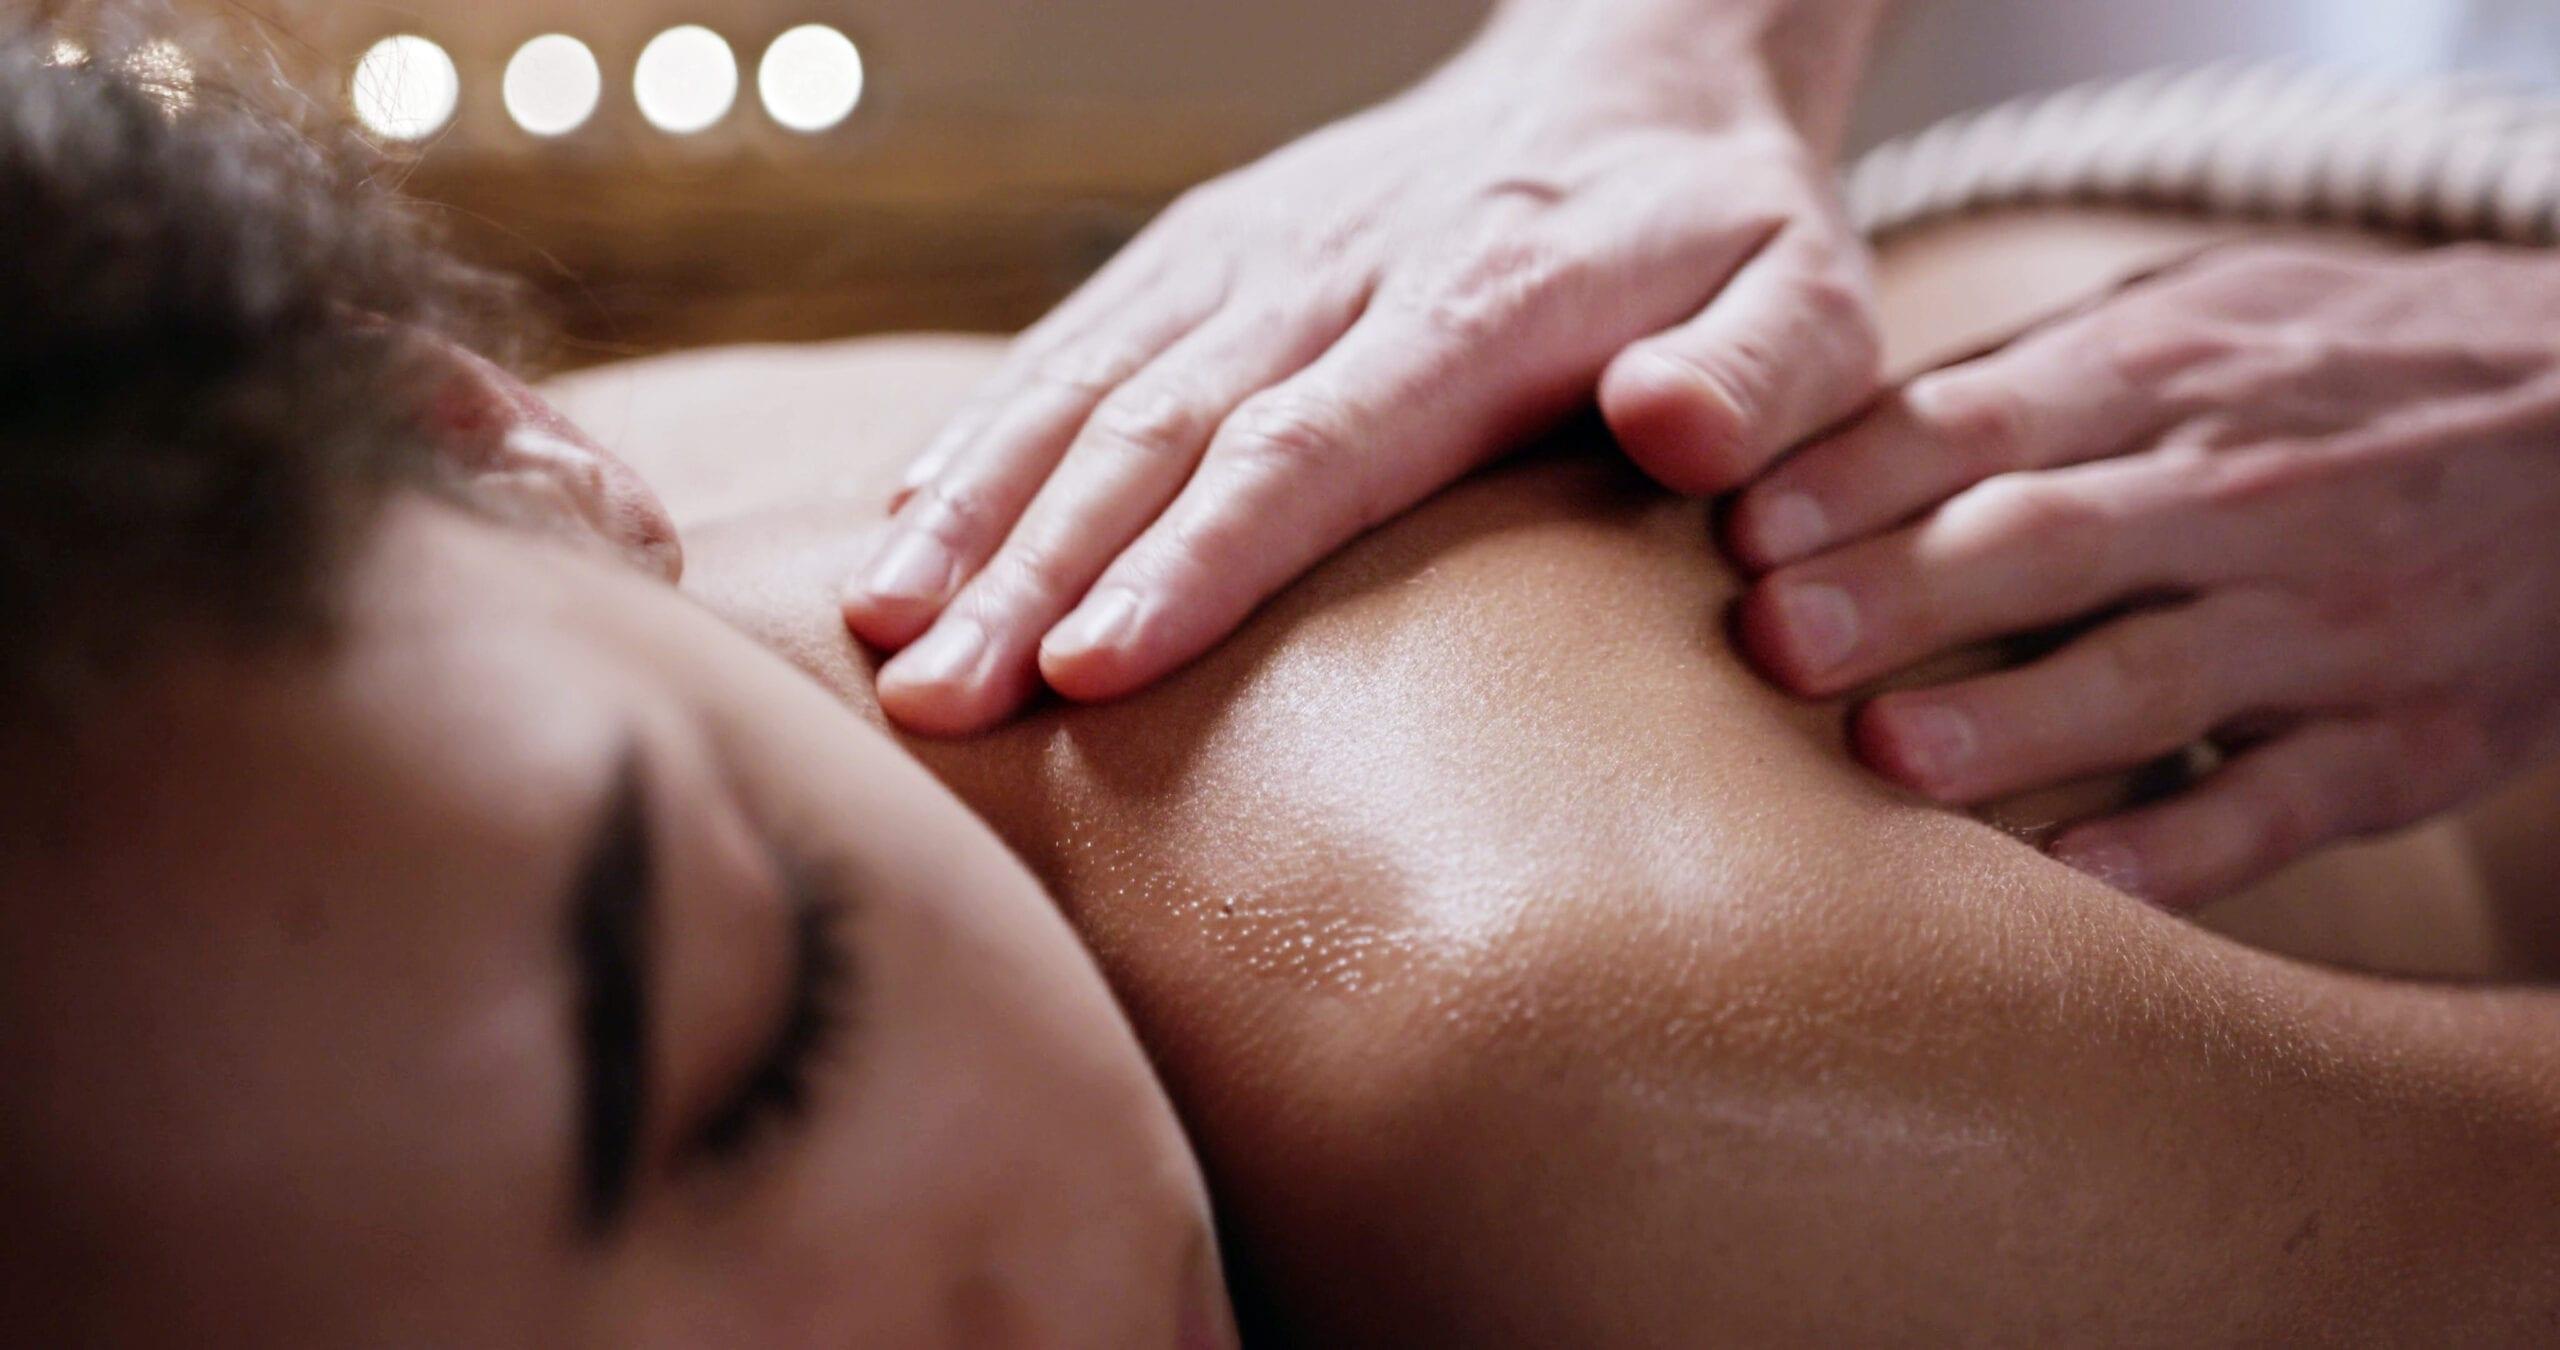 Blid massage på ryggen